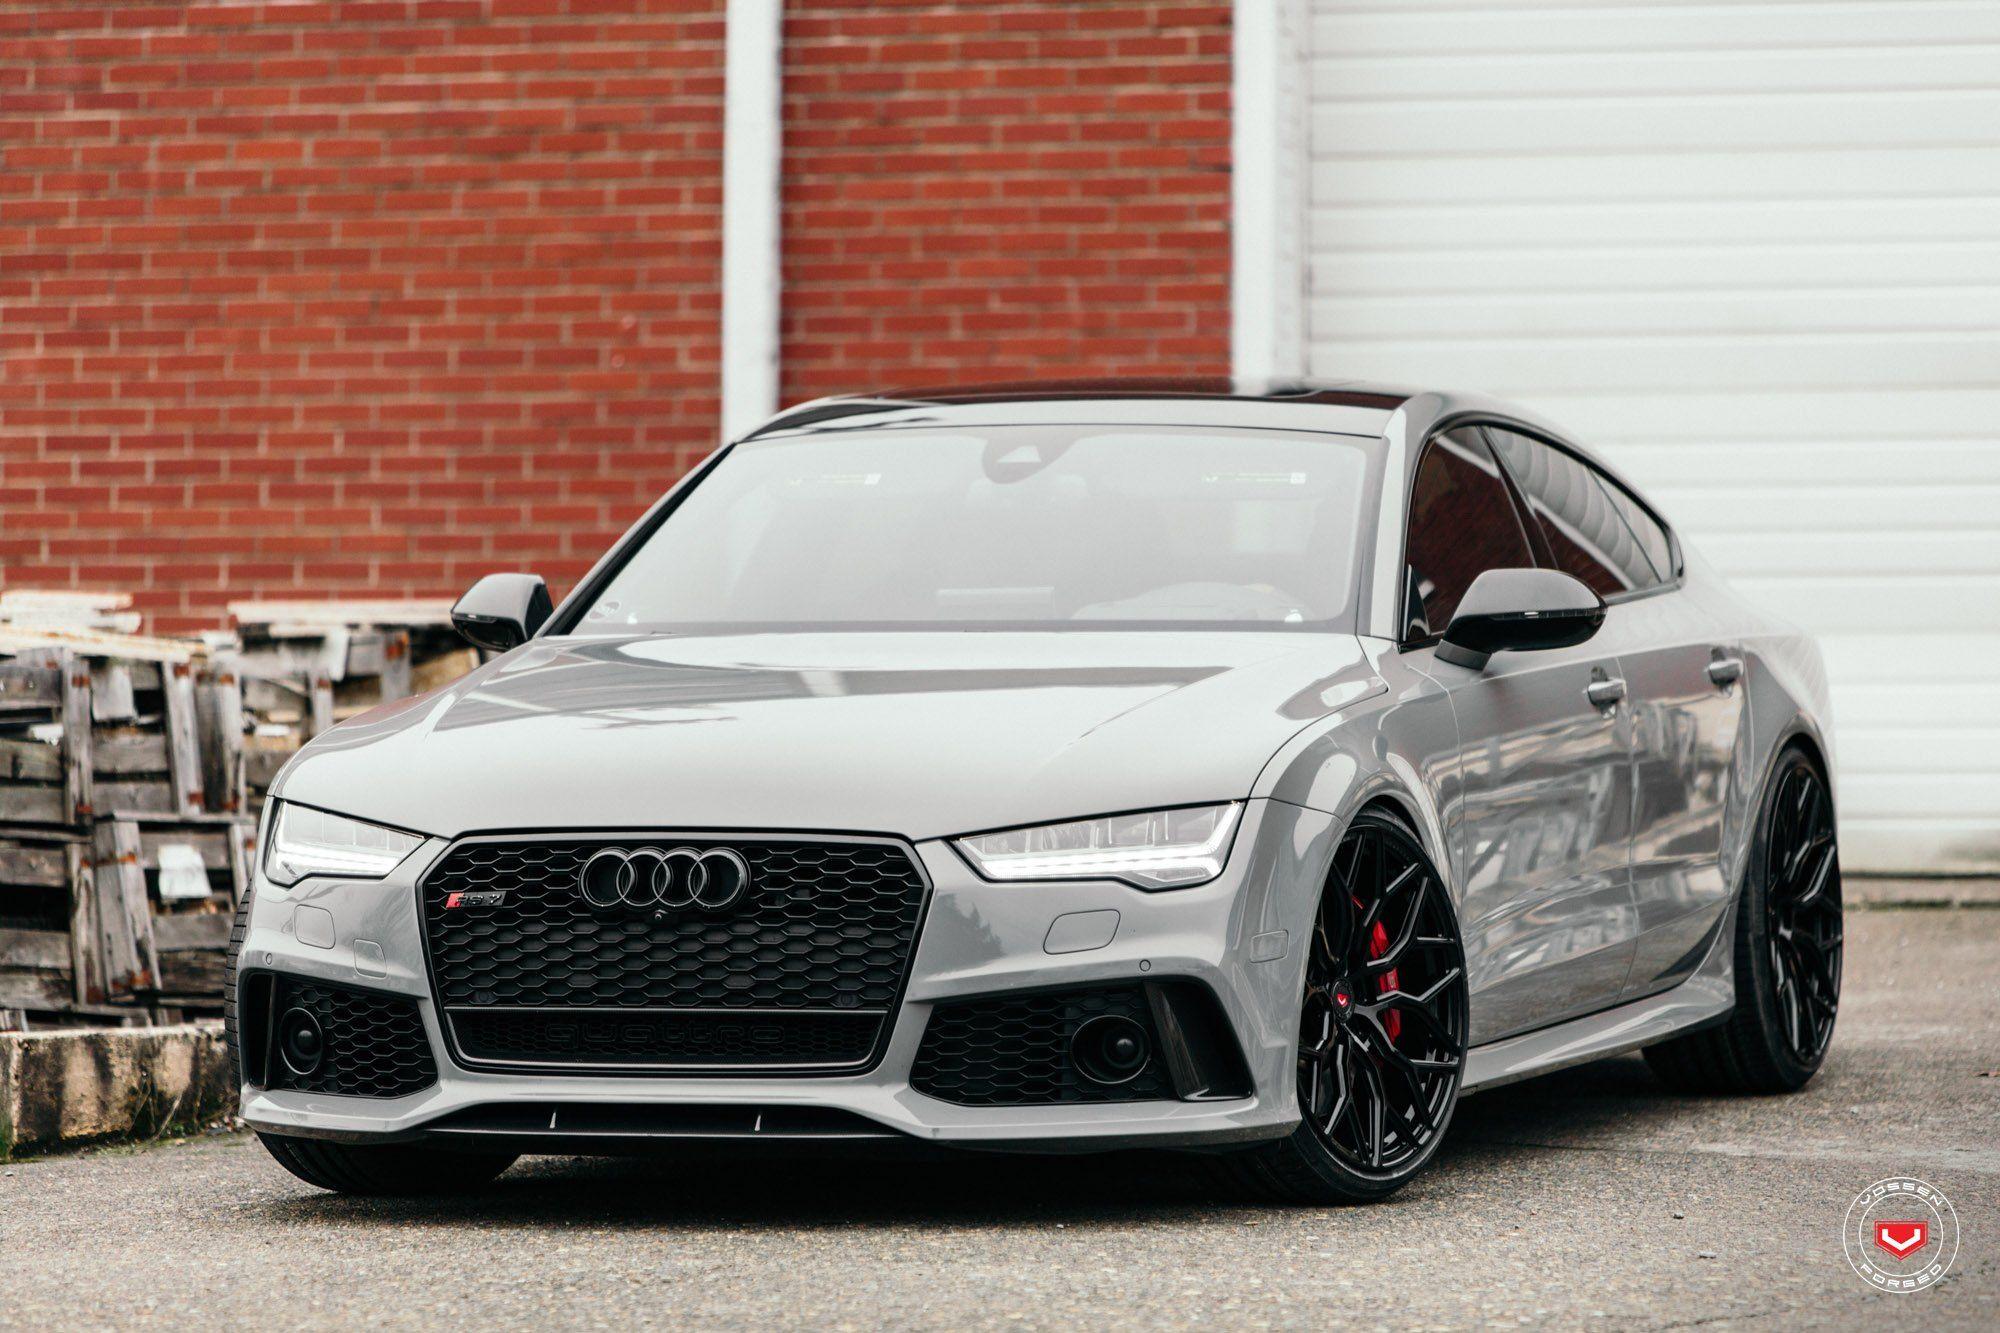 Royal Tuning For Gray Audi A7 Audi A7 Dream Cars Audi Audi